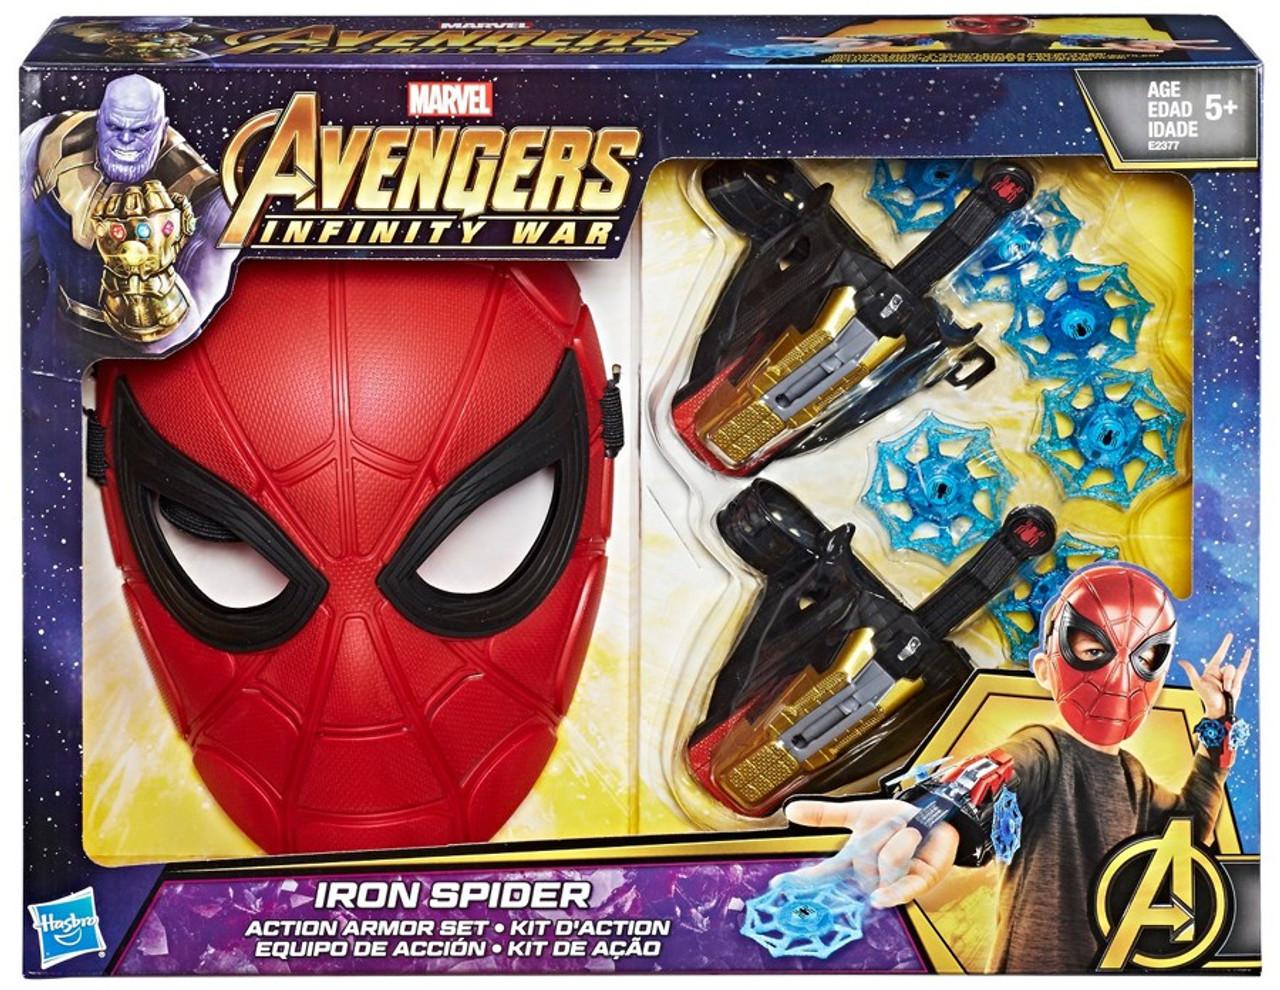 Marvel Avengers Infinity War Iron Spider Action Armor Set Exclusive Hasbro Toys Toywiz